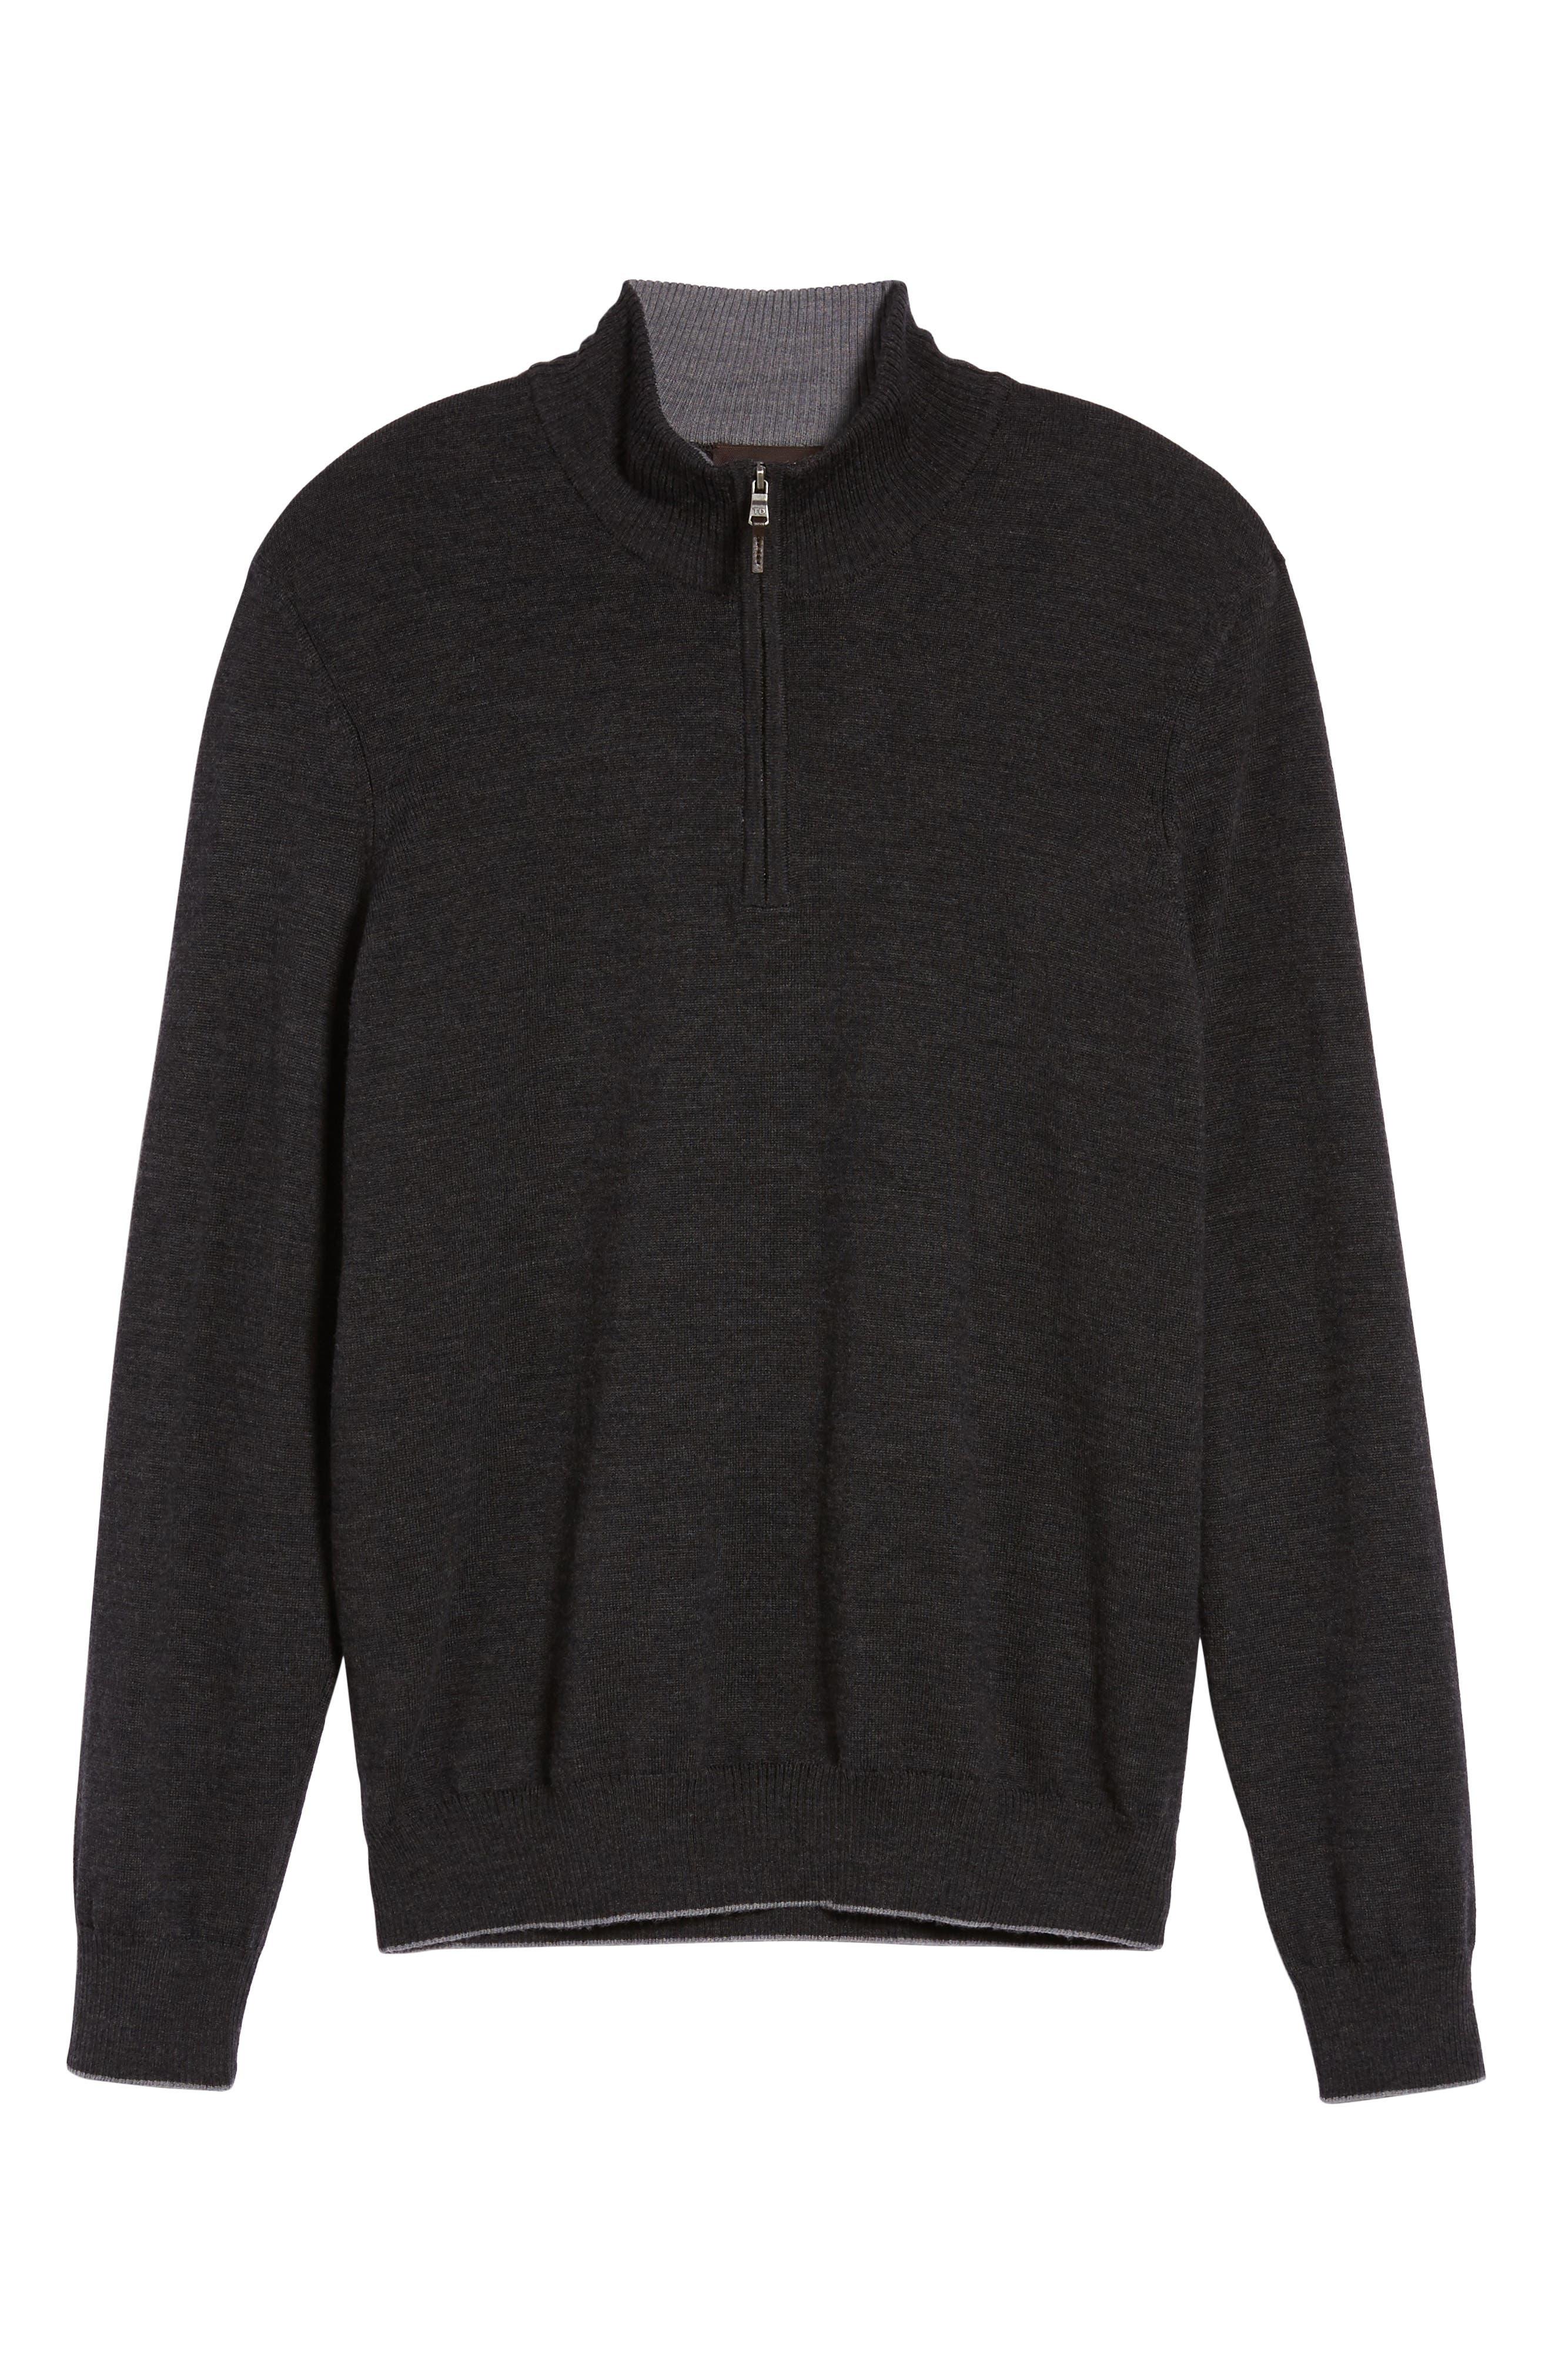 THOMAS DEAN,                             Merino Wool Blend Quarter Zip Sweater,                             Alternate thumbnail 6, color,                             020